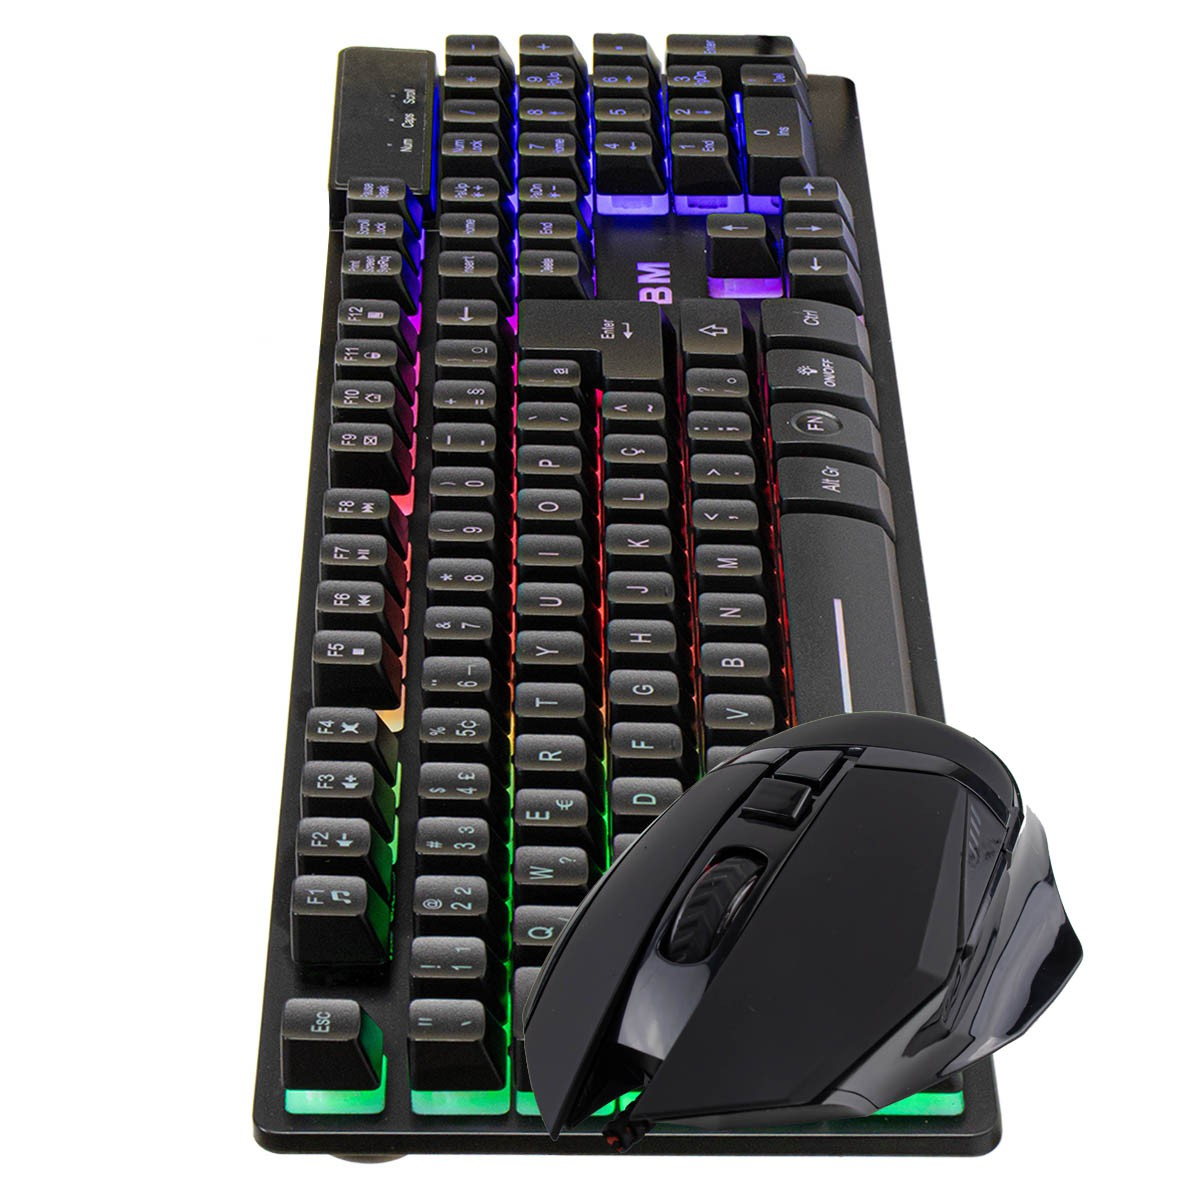 KIT Teclado Gamer Semi Mecânico com LED BM-T06 + Mouse Gamer RGB GM-601